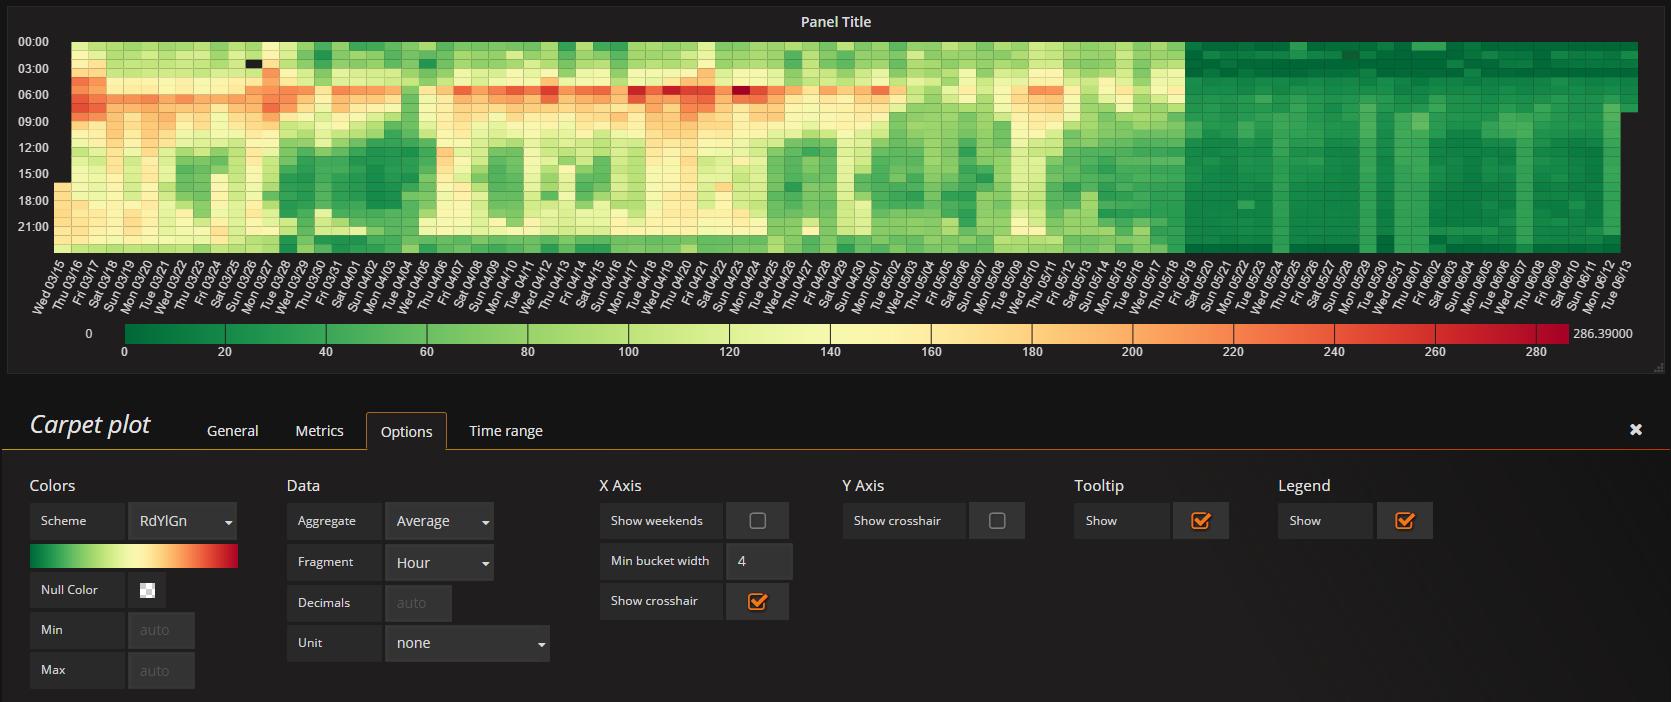 Carpet plot - Screenshot 1 - Panel and options